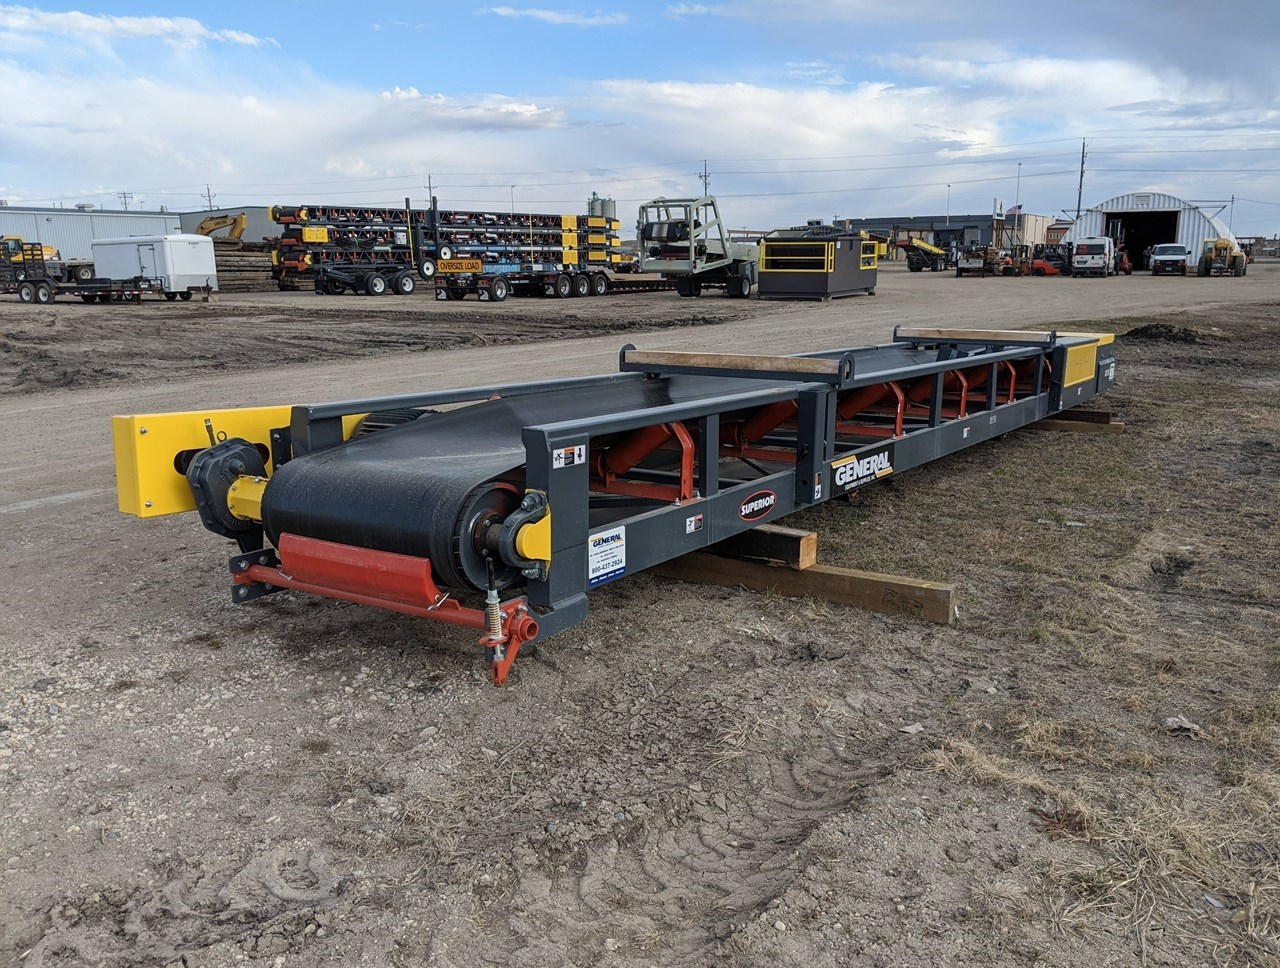 2019 Superior 36X30CFC Conveyor - Transfer For Sale